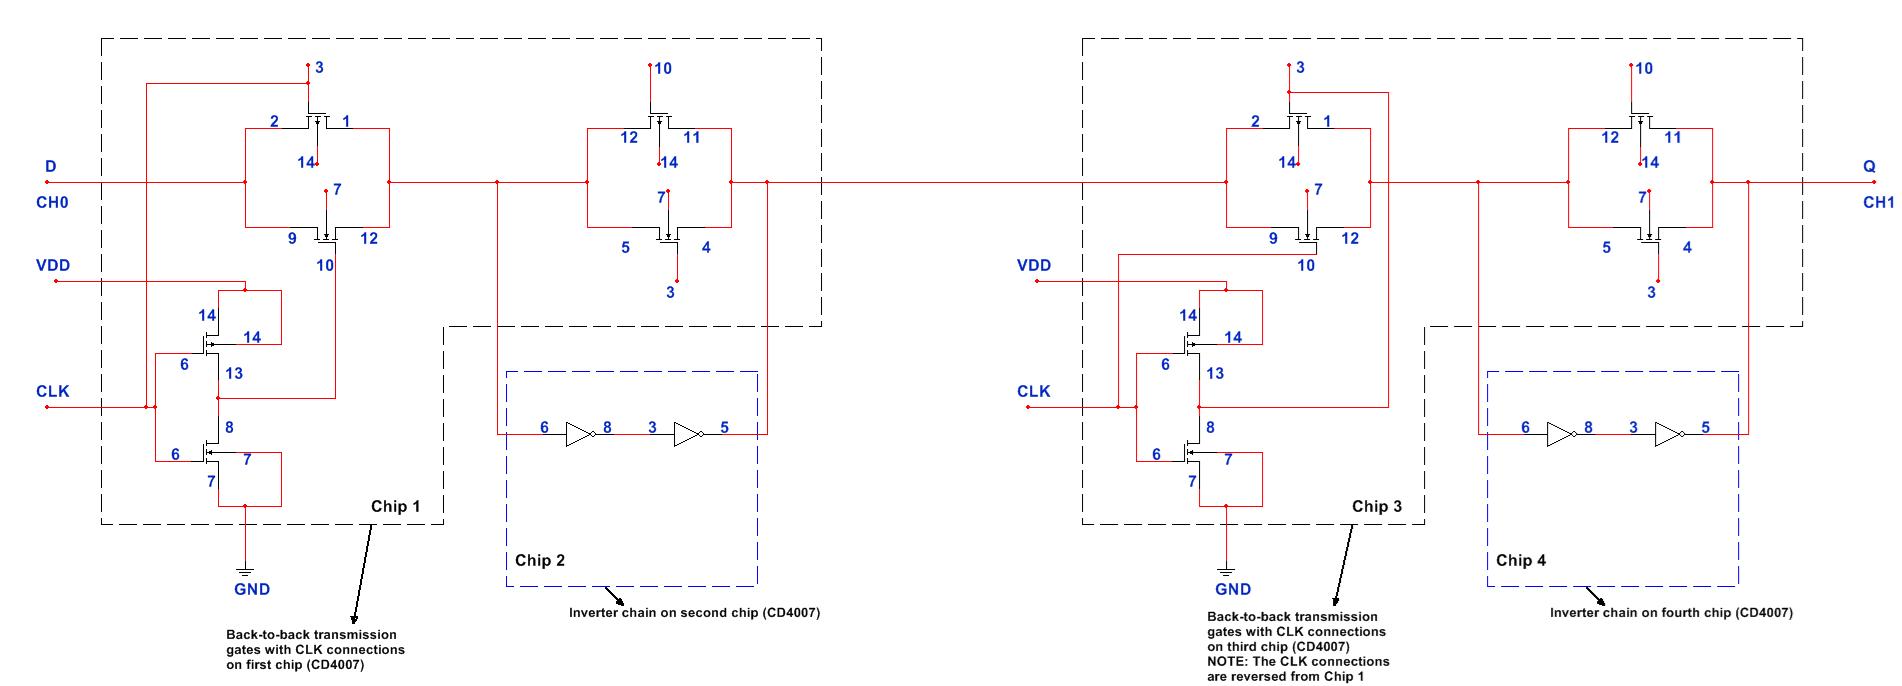 Popular Circuits Page 225 Band Stop Filter Notch Resonant Circuit 555circuit Cmos Logic